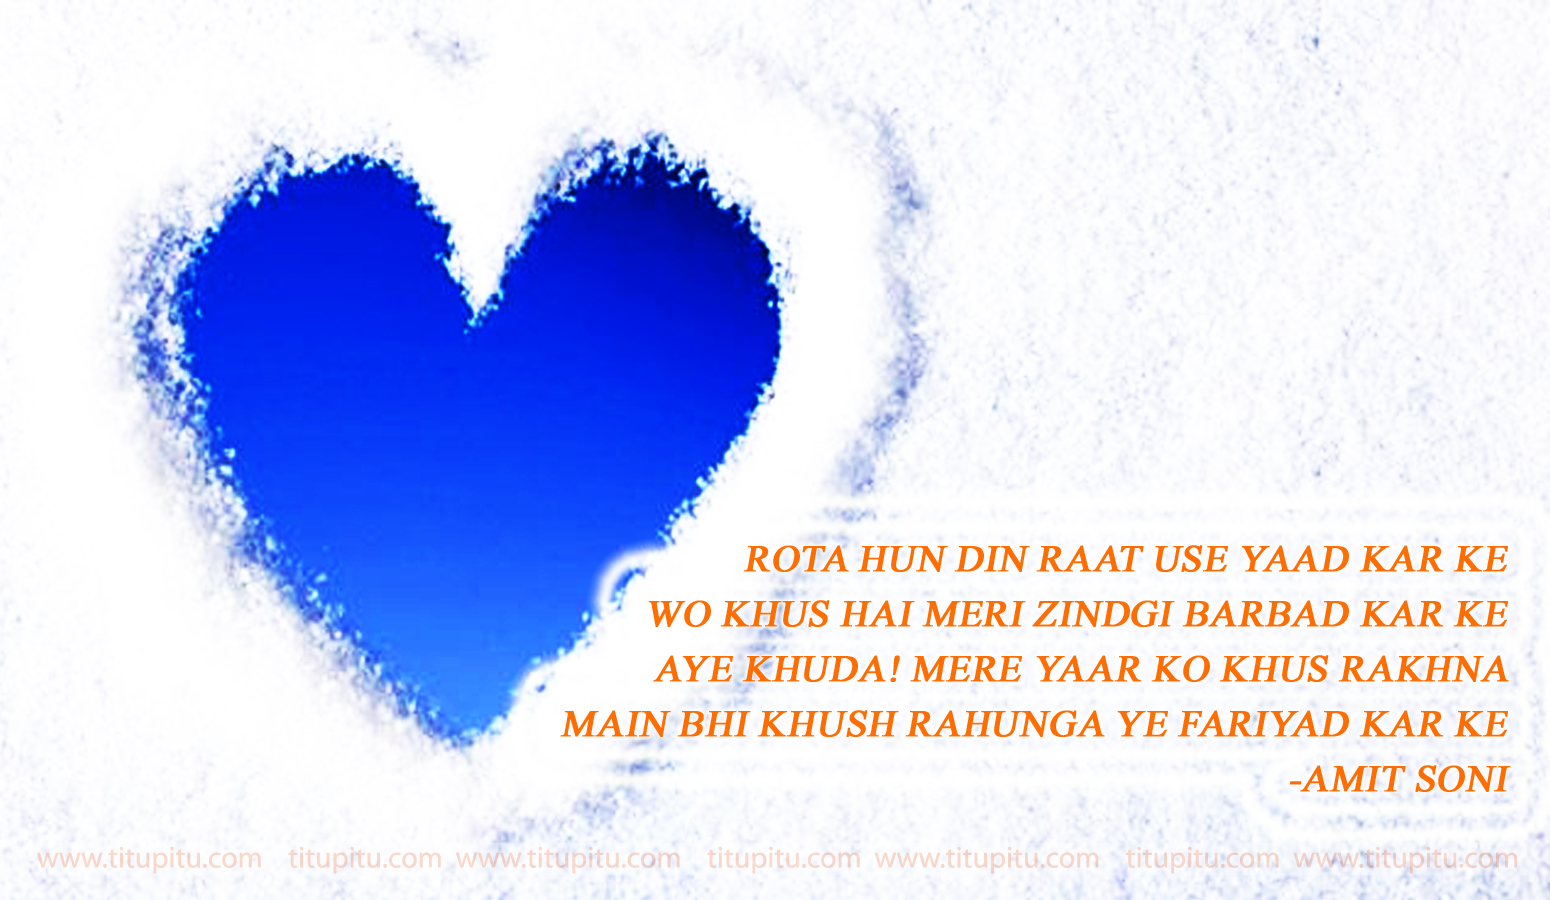 Dard bhari dosti shayari 140 and sad images | Haryanvi